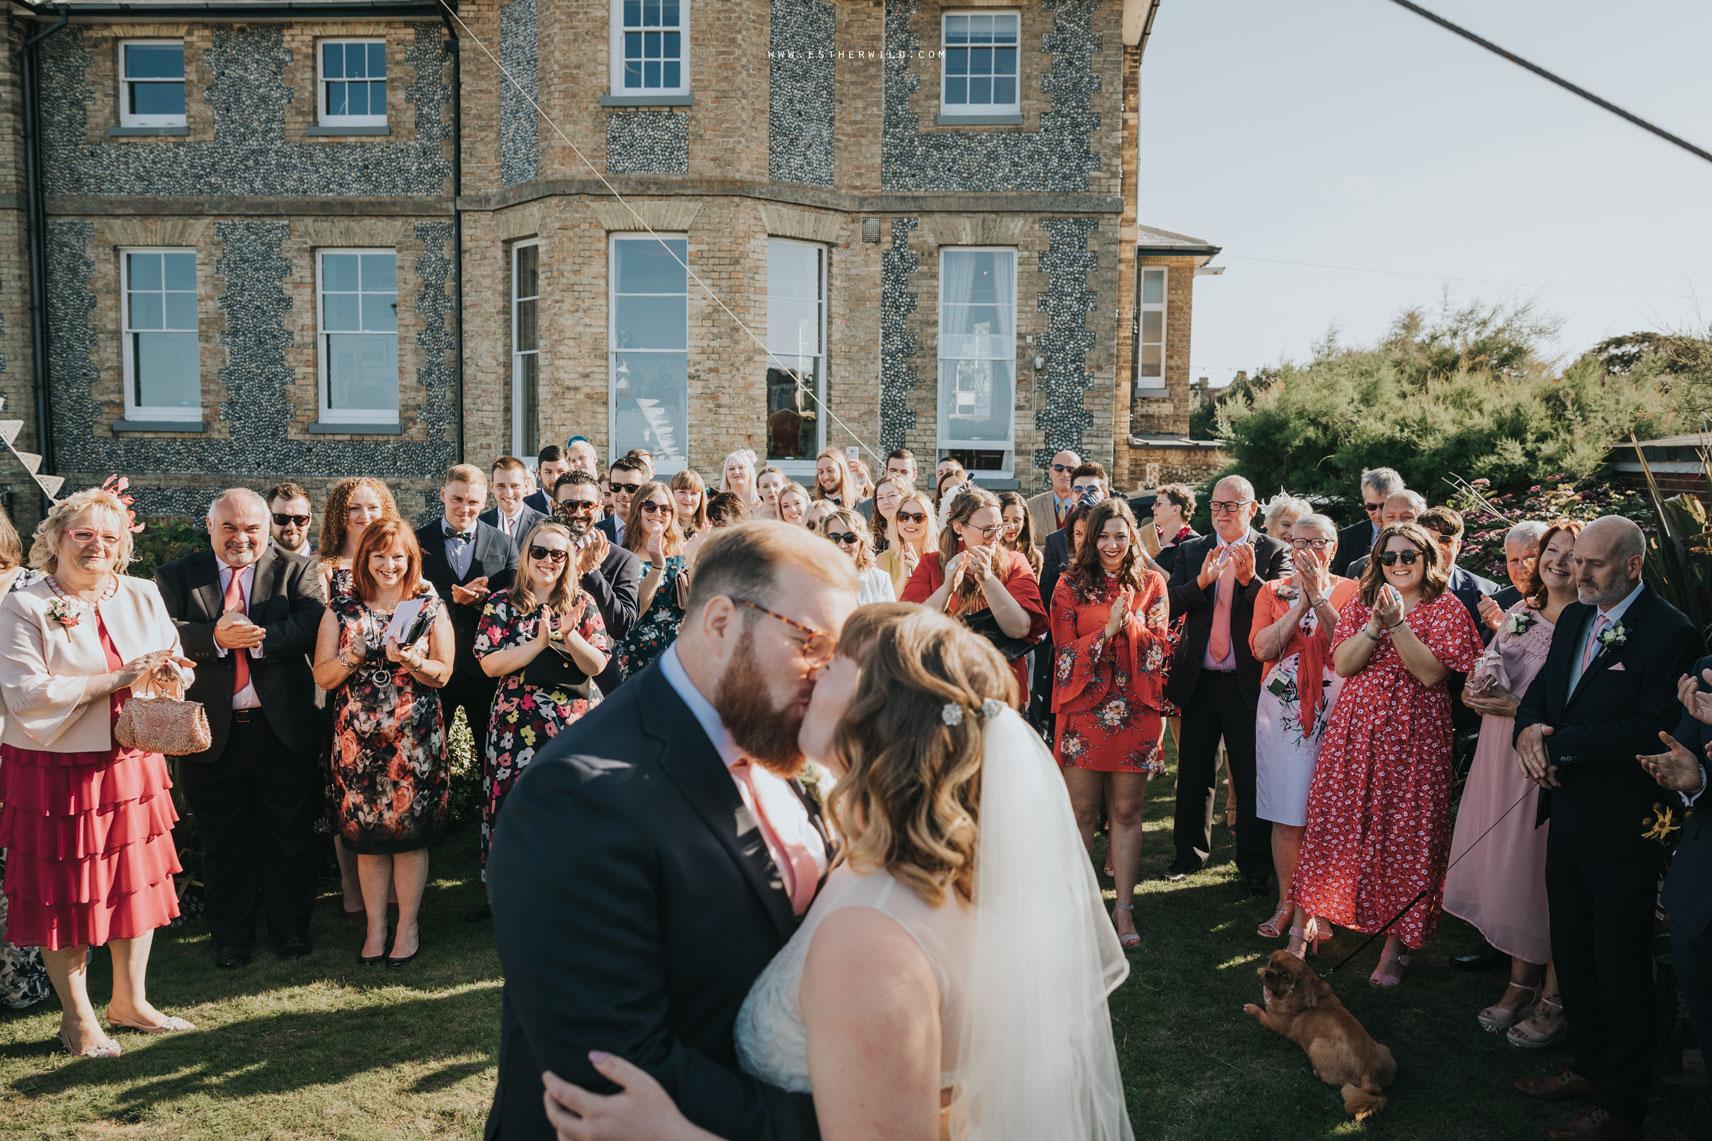 Cromer_Wedding_Beach_Outdoor_Ceremony_Norfolk_North_Lodge_Registry_Office_Rocket_House_Cafe_Cromer_Pier_IMG_3947.jpg